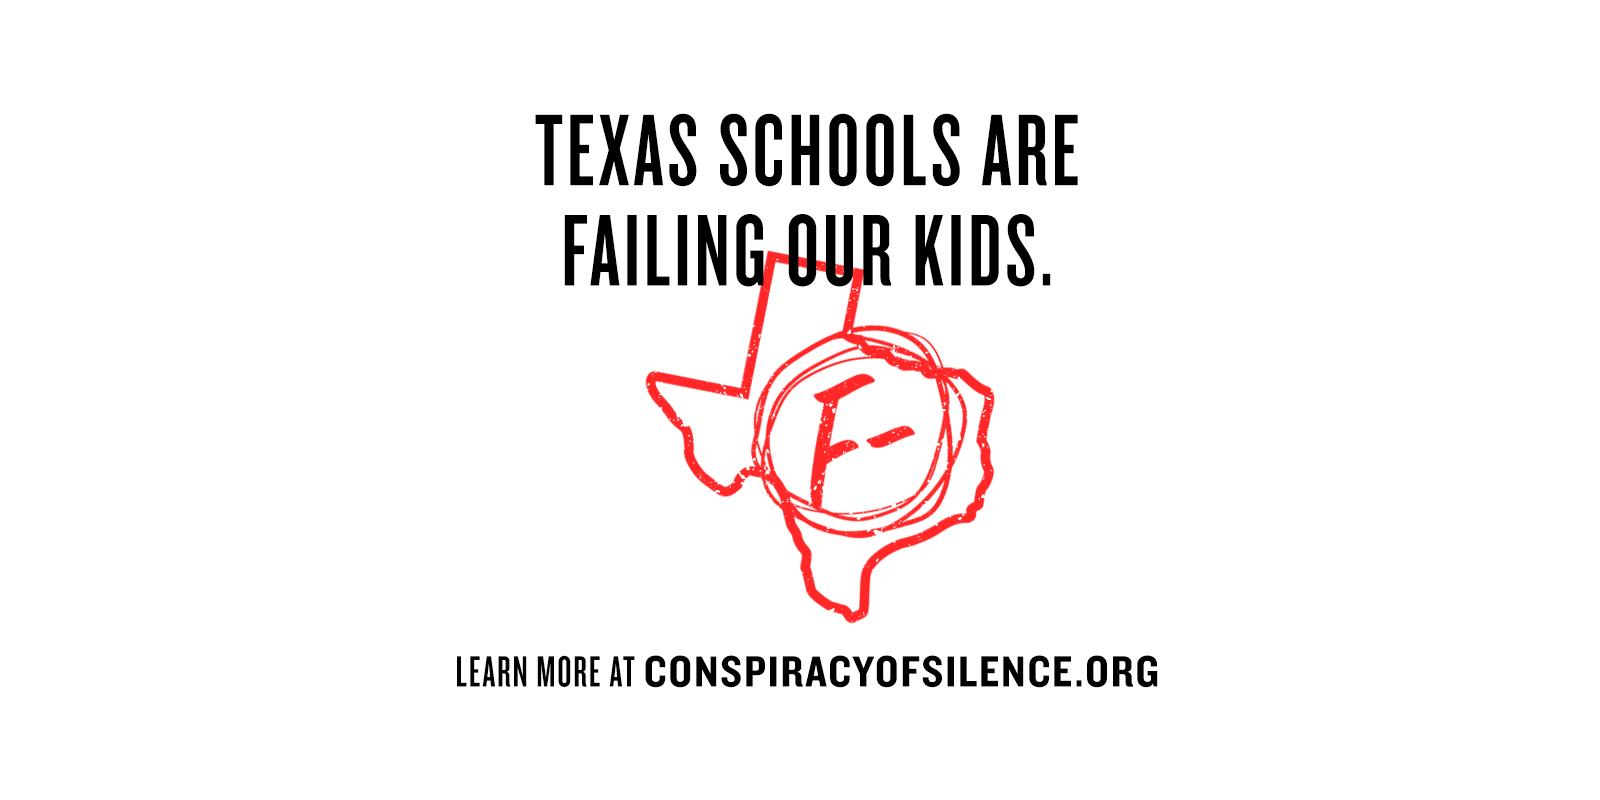 tfn_texasschools